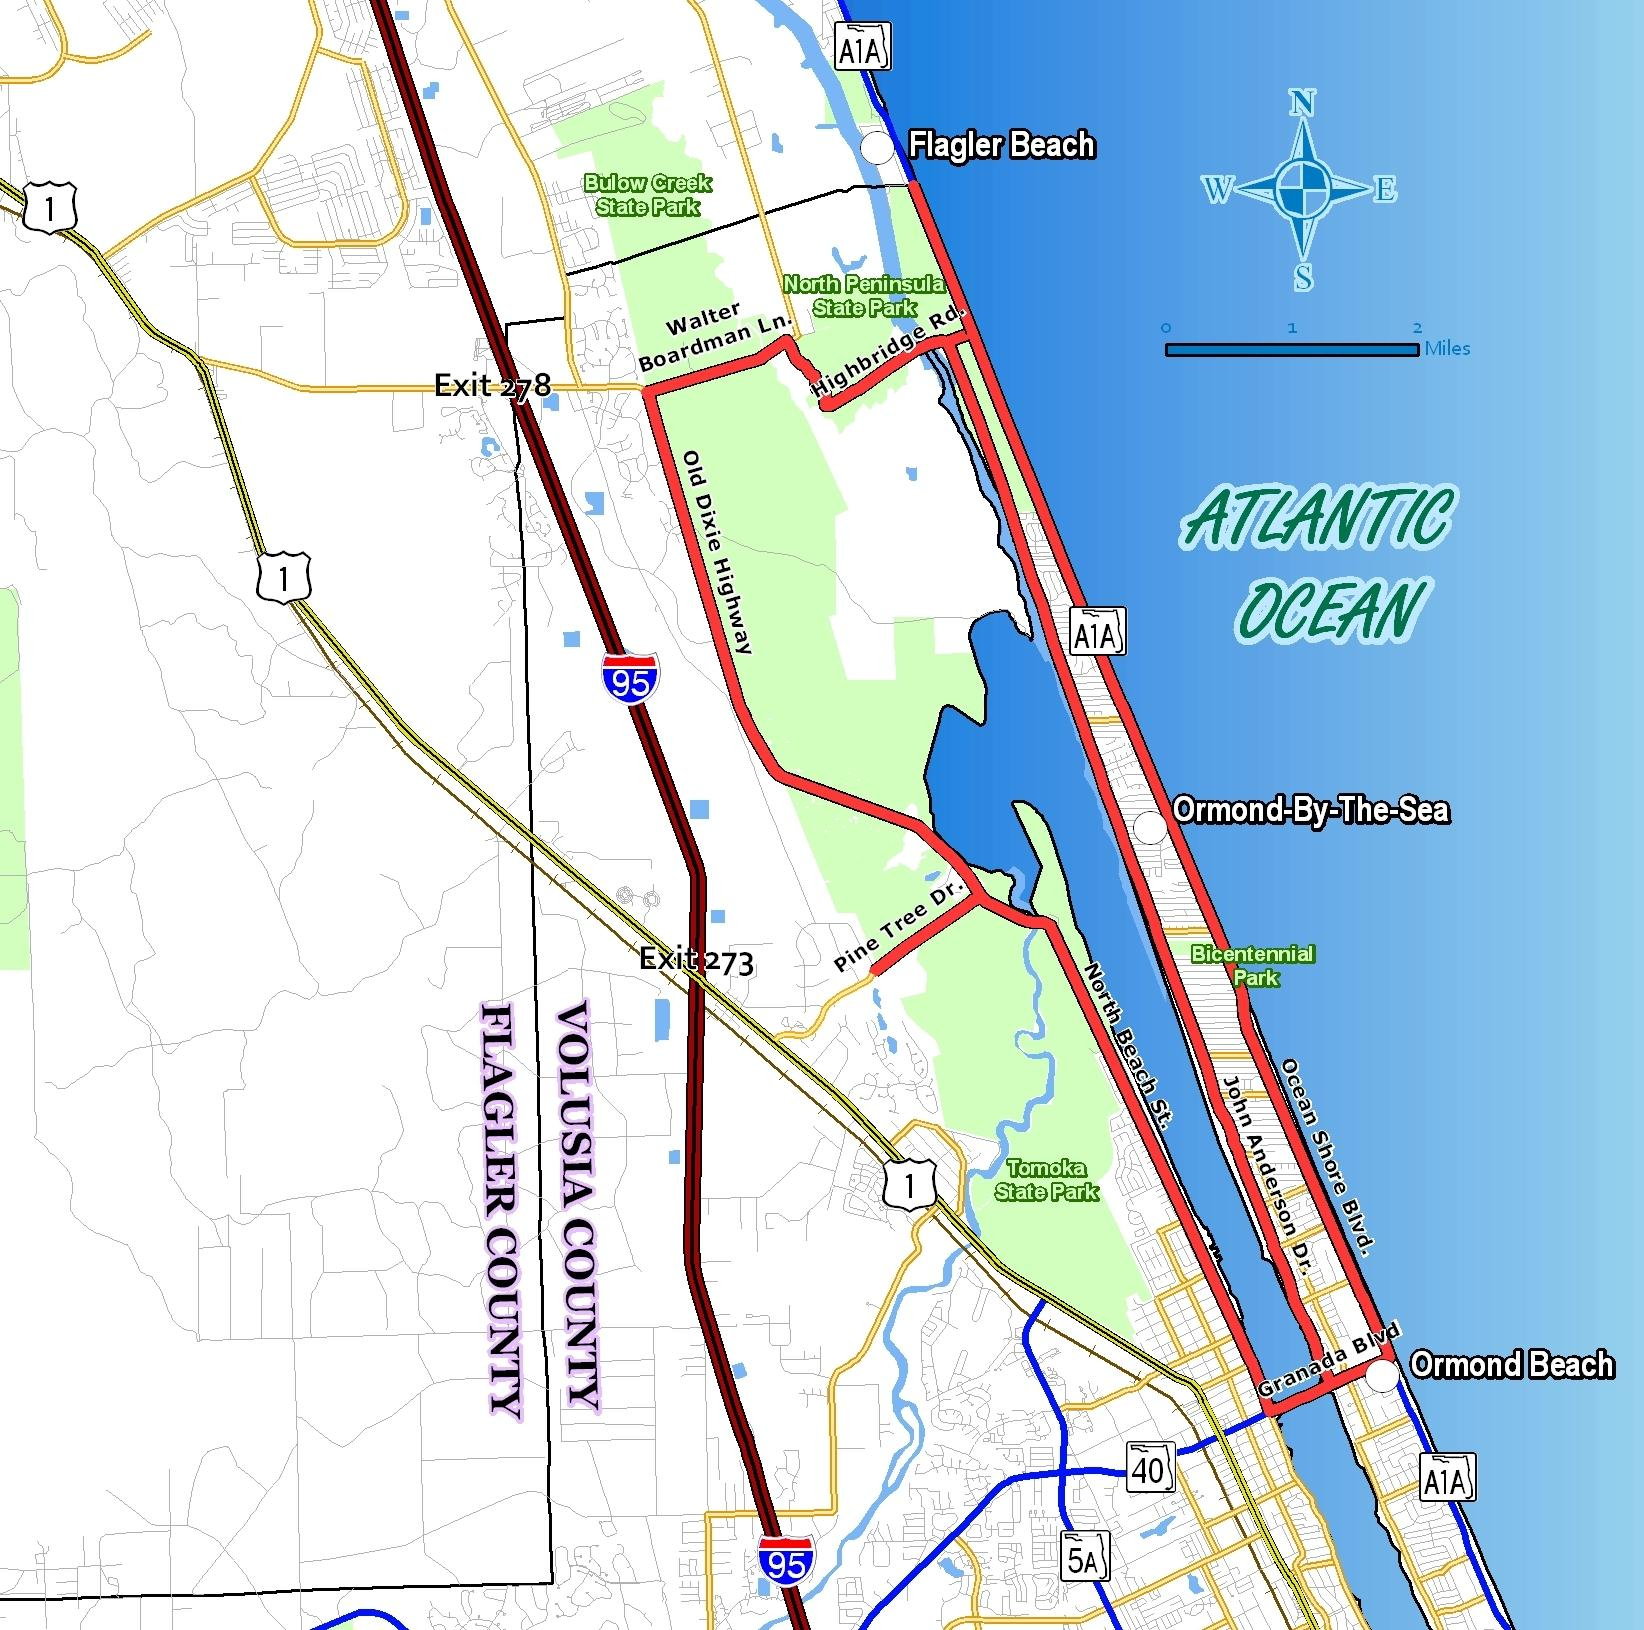 Oslt Index - Street Map Of Ormond Beach Florida